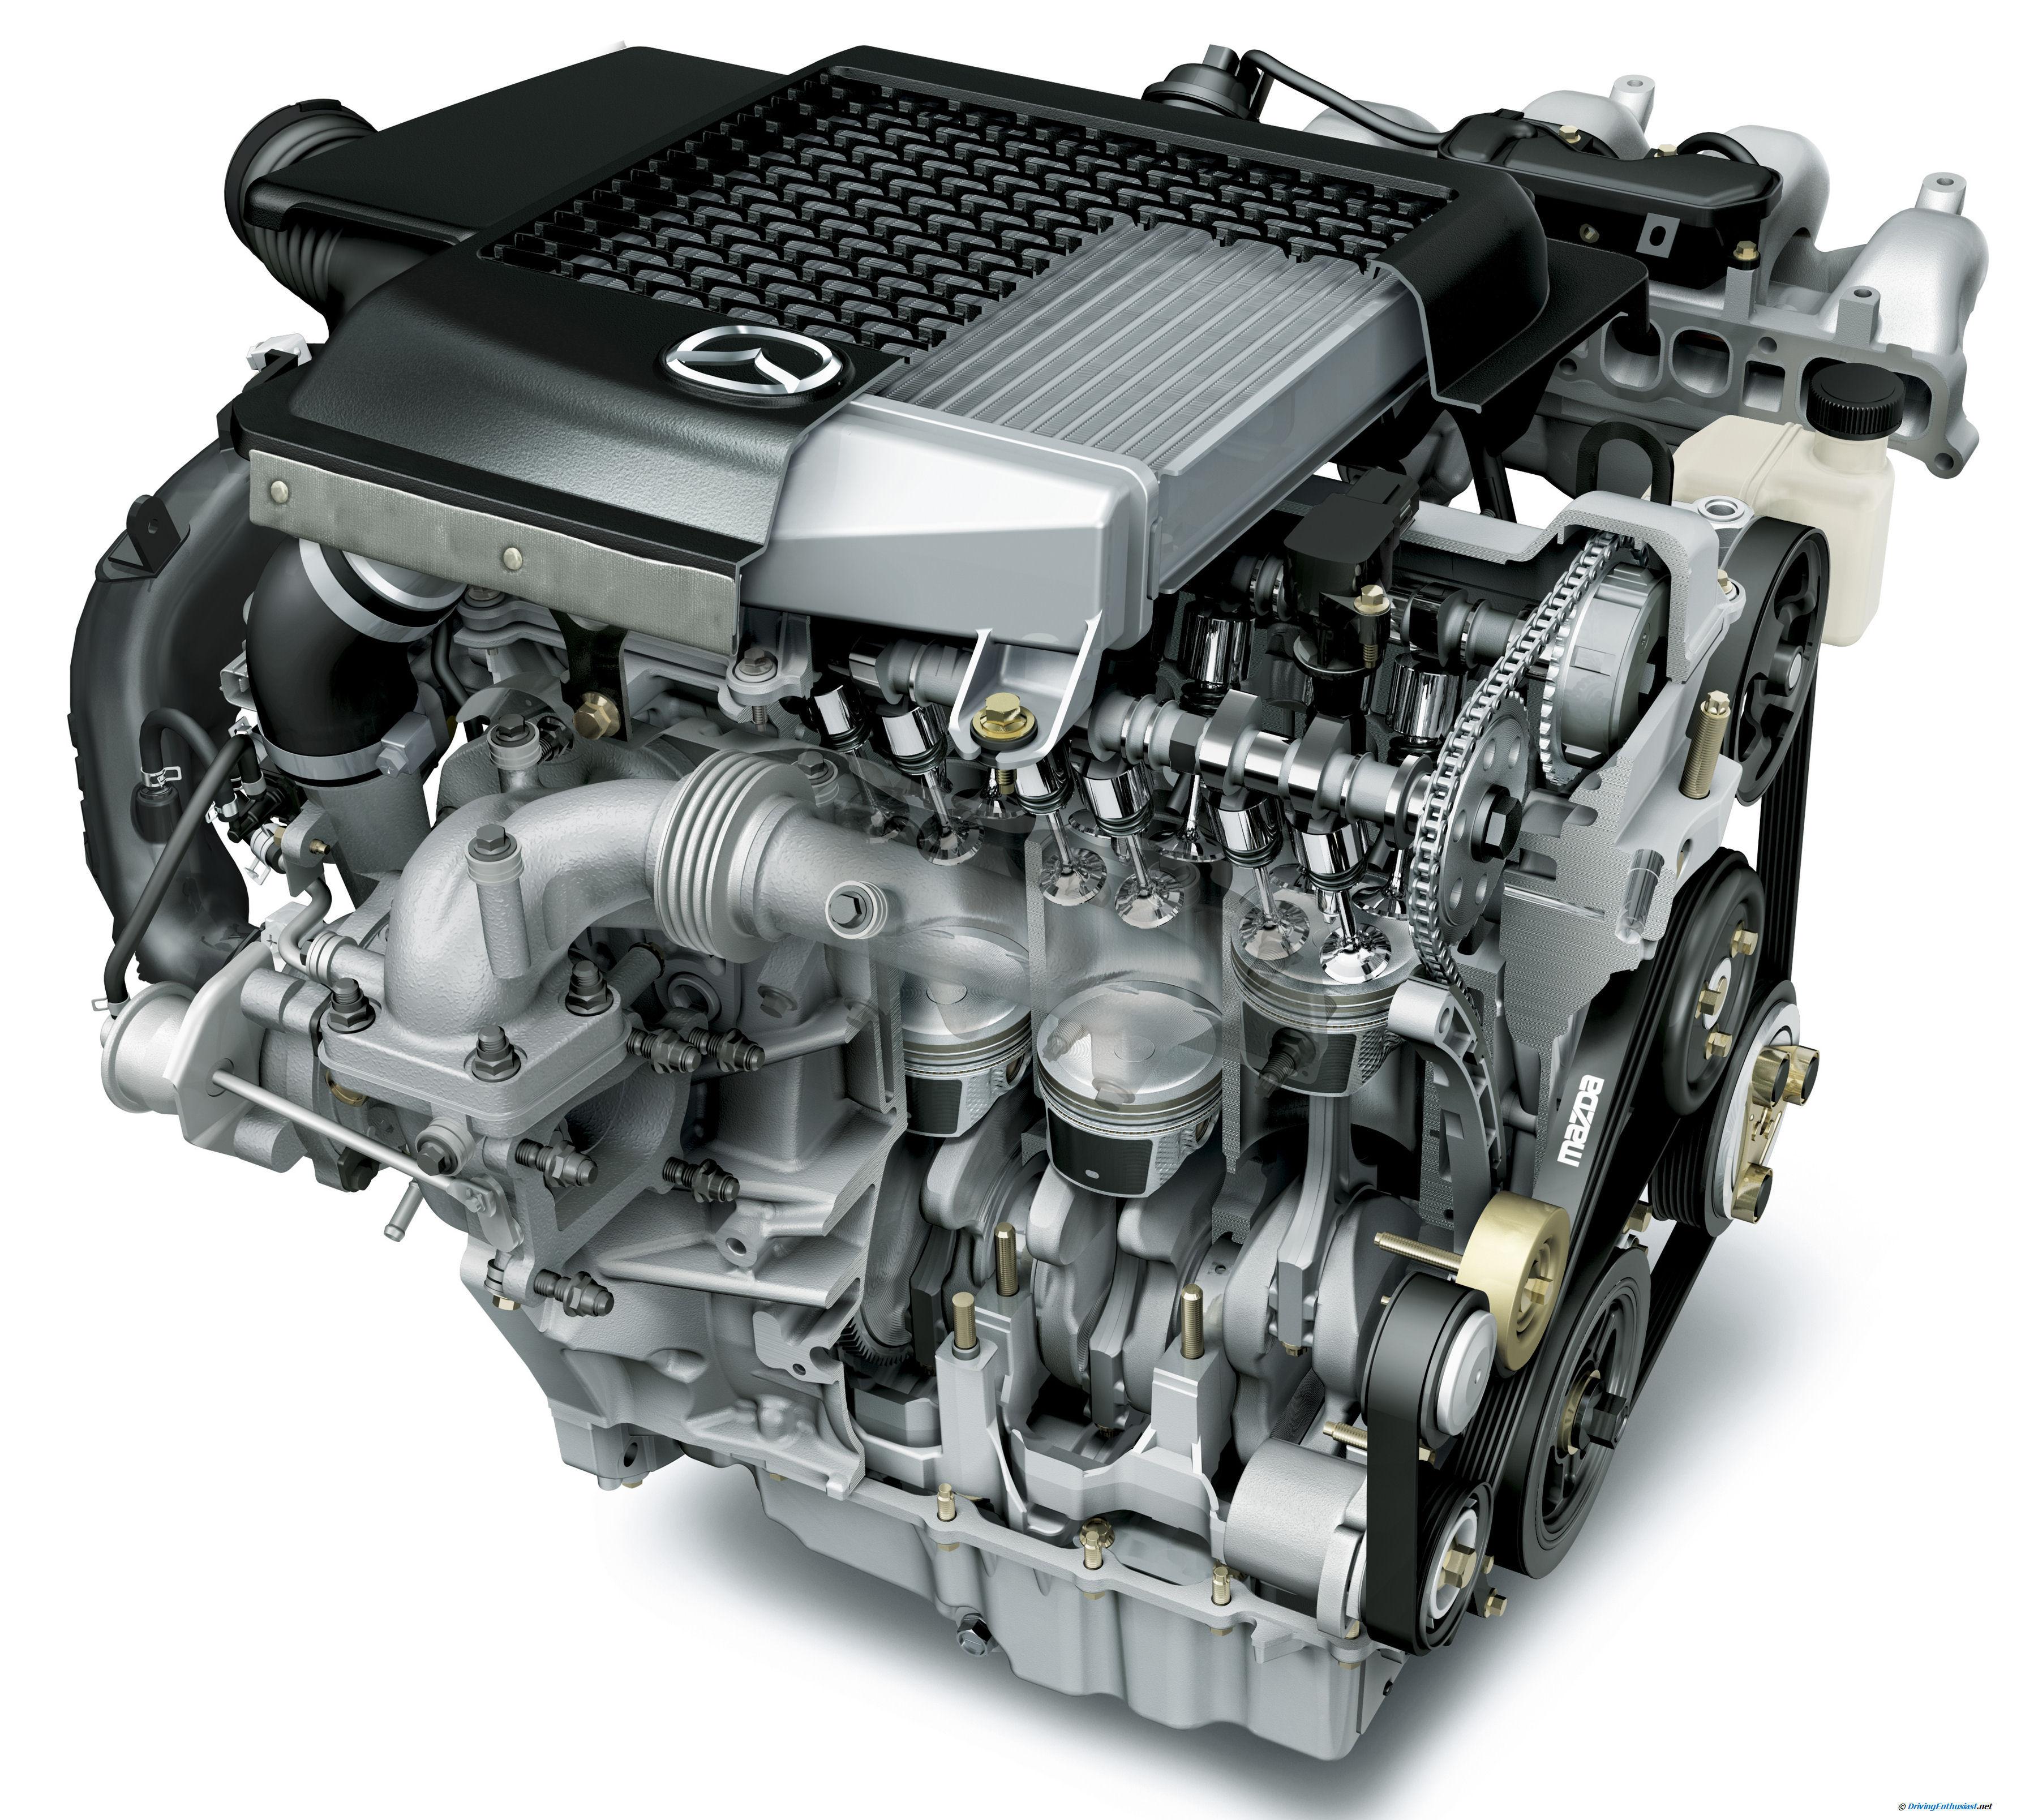 Mitsubishi 2.0L Engines for Sale